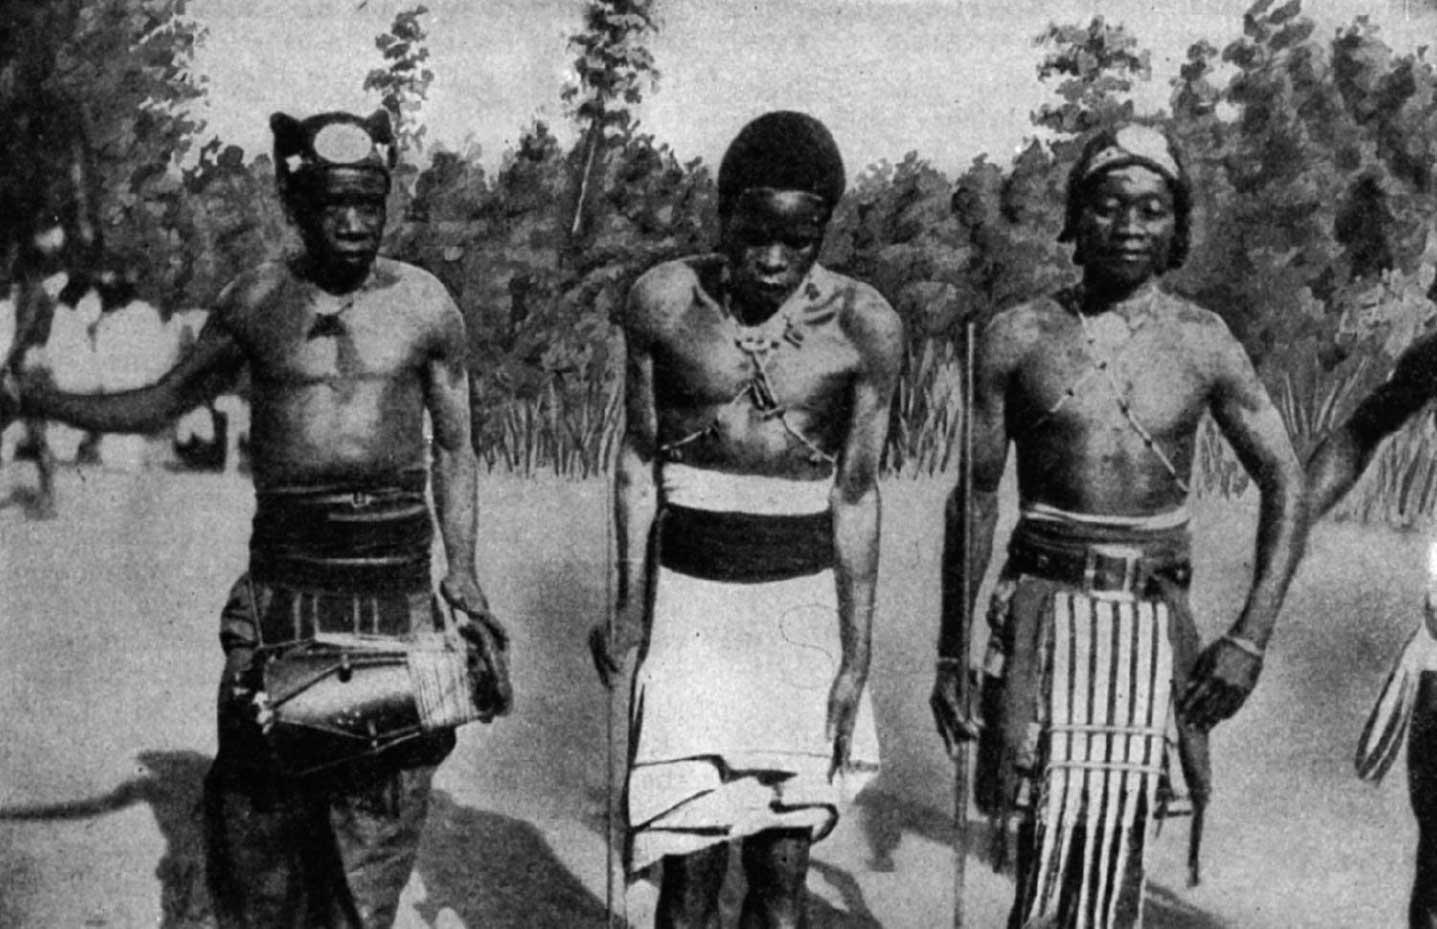 Belle africaine belgique 2 - 2 3